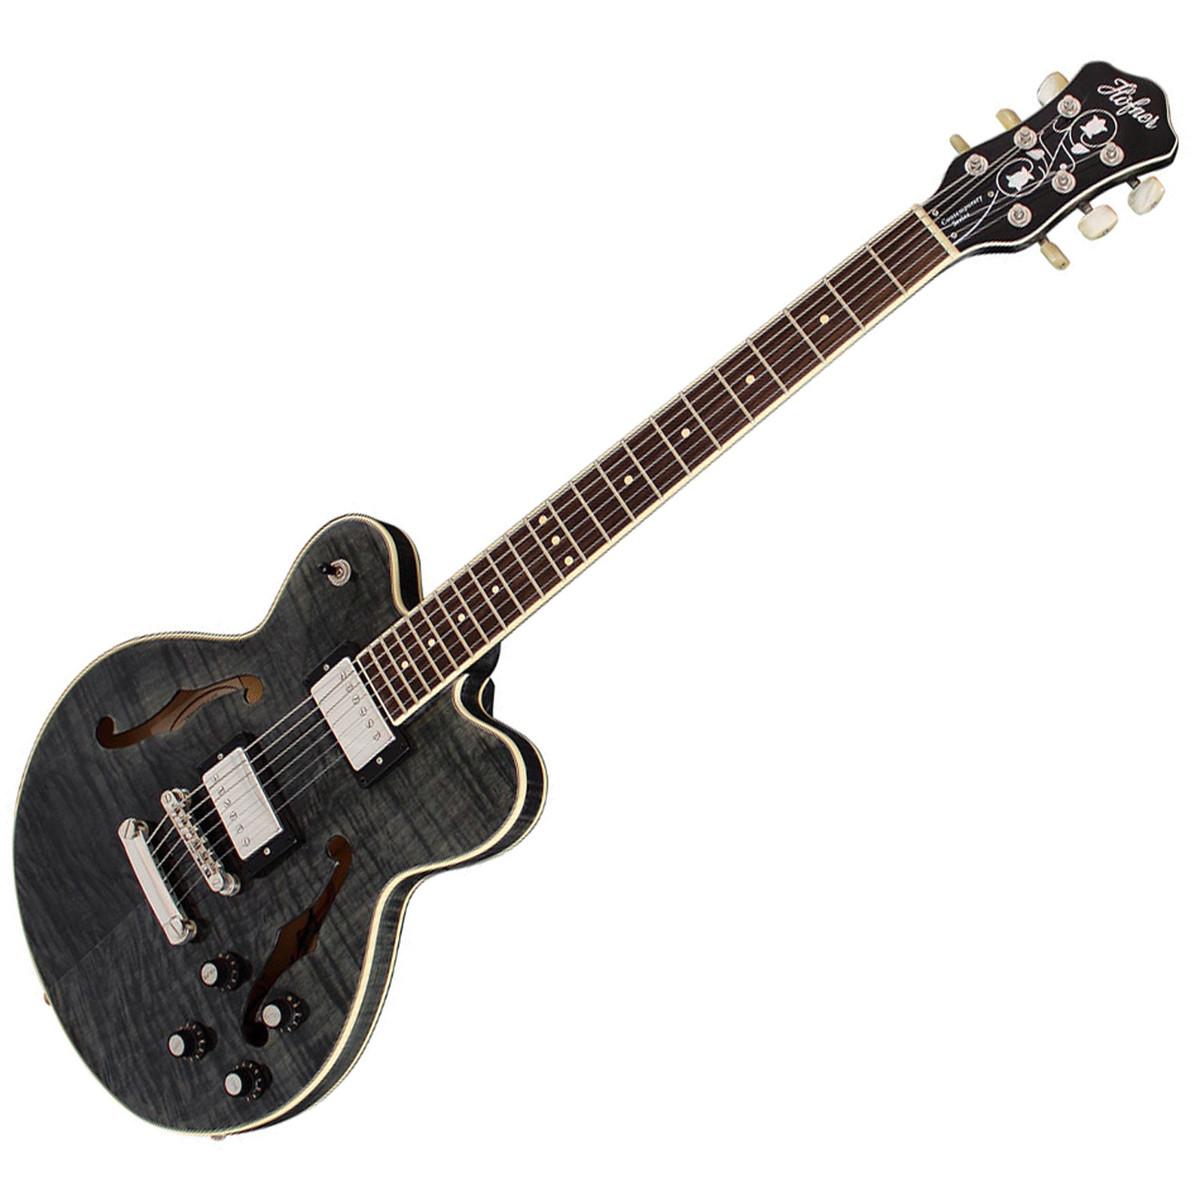 hofner verythin guitare lectrique deluxe noir. Black Bedroom Furniture Sets. Home Design Ideas